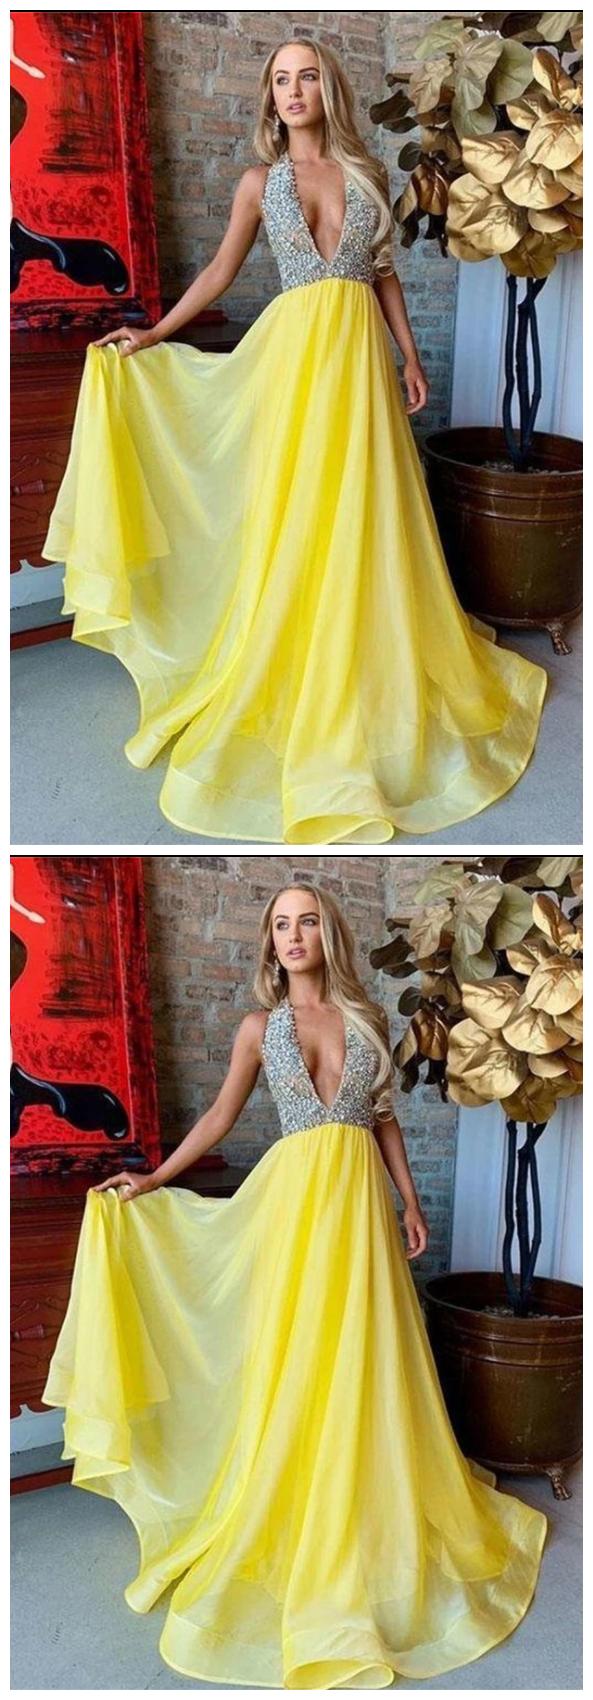 Yellow V Neck Rhinestone Sweep Train Prom Dress In 2021 Prom Dresses Yellow Sweep Train Prom Dress Plus Size Prom Dresses [ 1700 x 593 Pixel ]